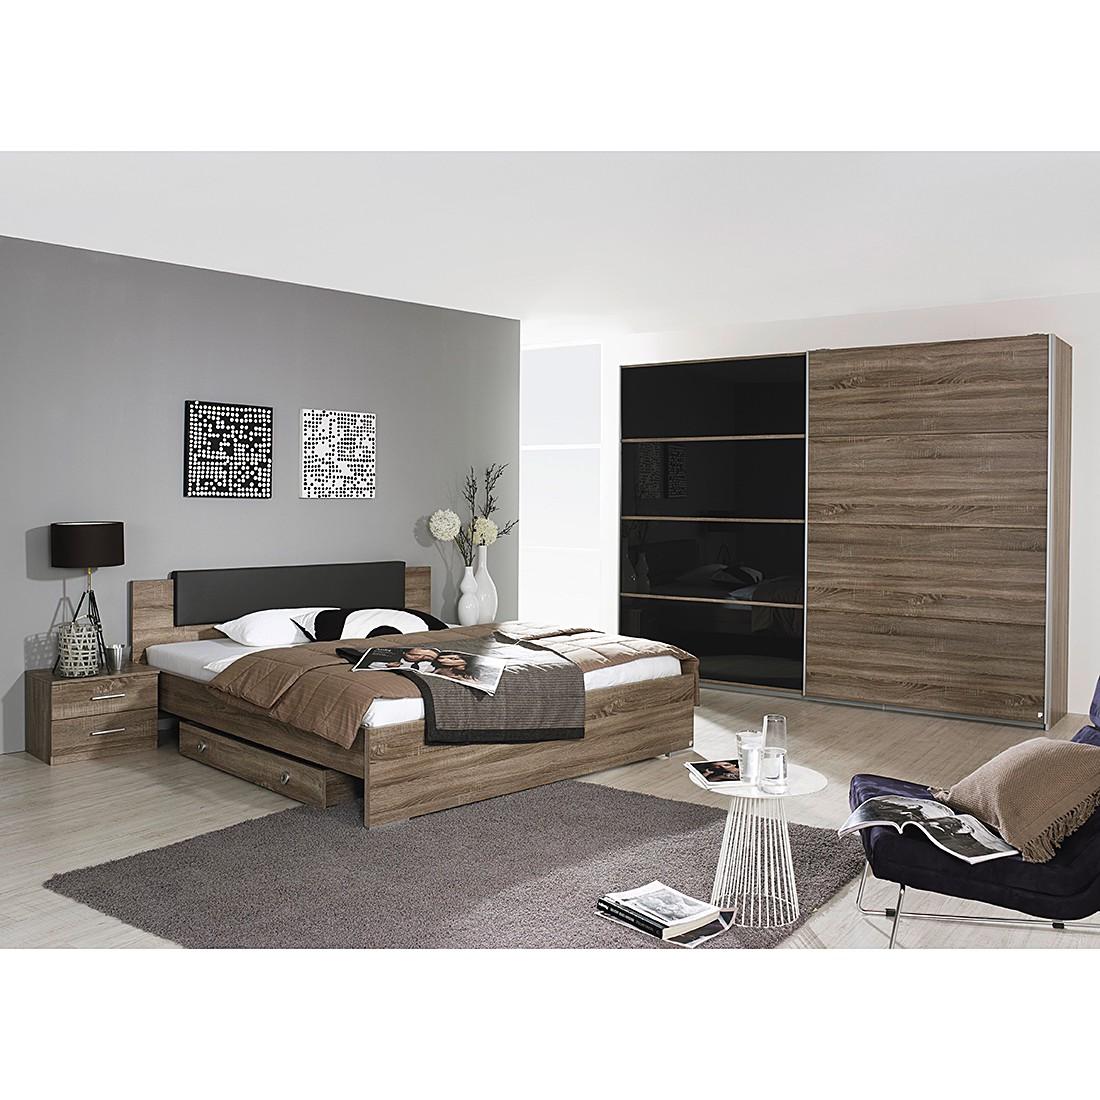 komplettzimmer classic oak eiche havanna basalt liegefl che bett 160 x 200cm rauch bestellen. Black Bedroom Furniture Sets. Home Design Ideas